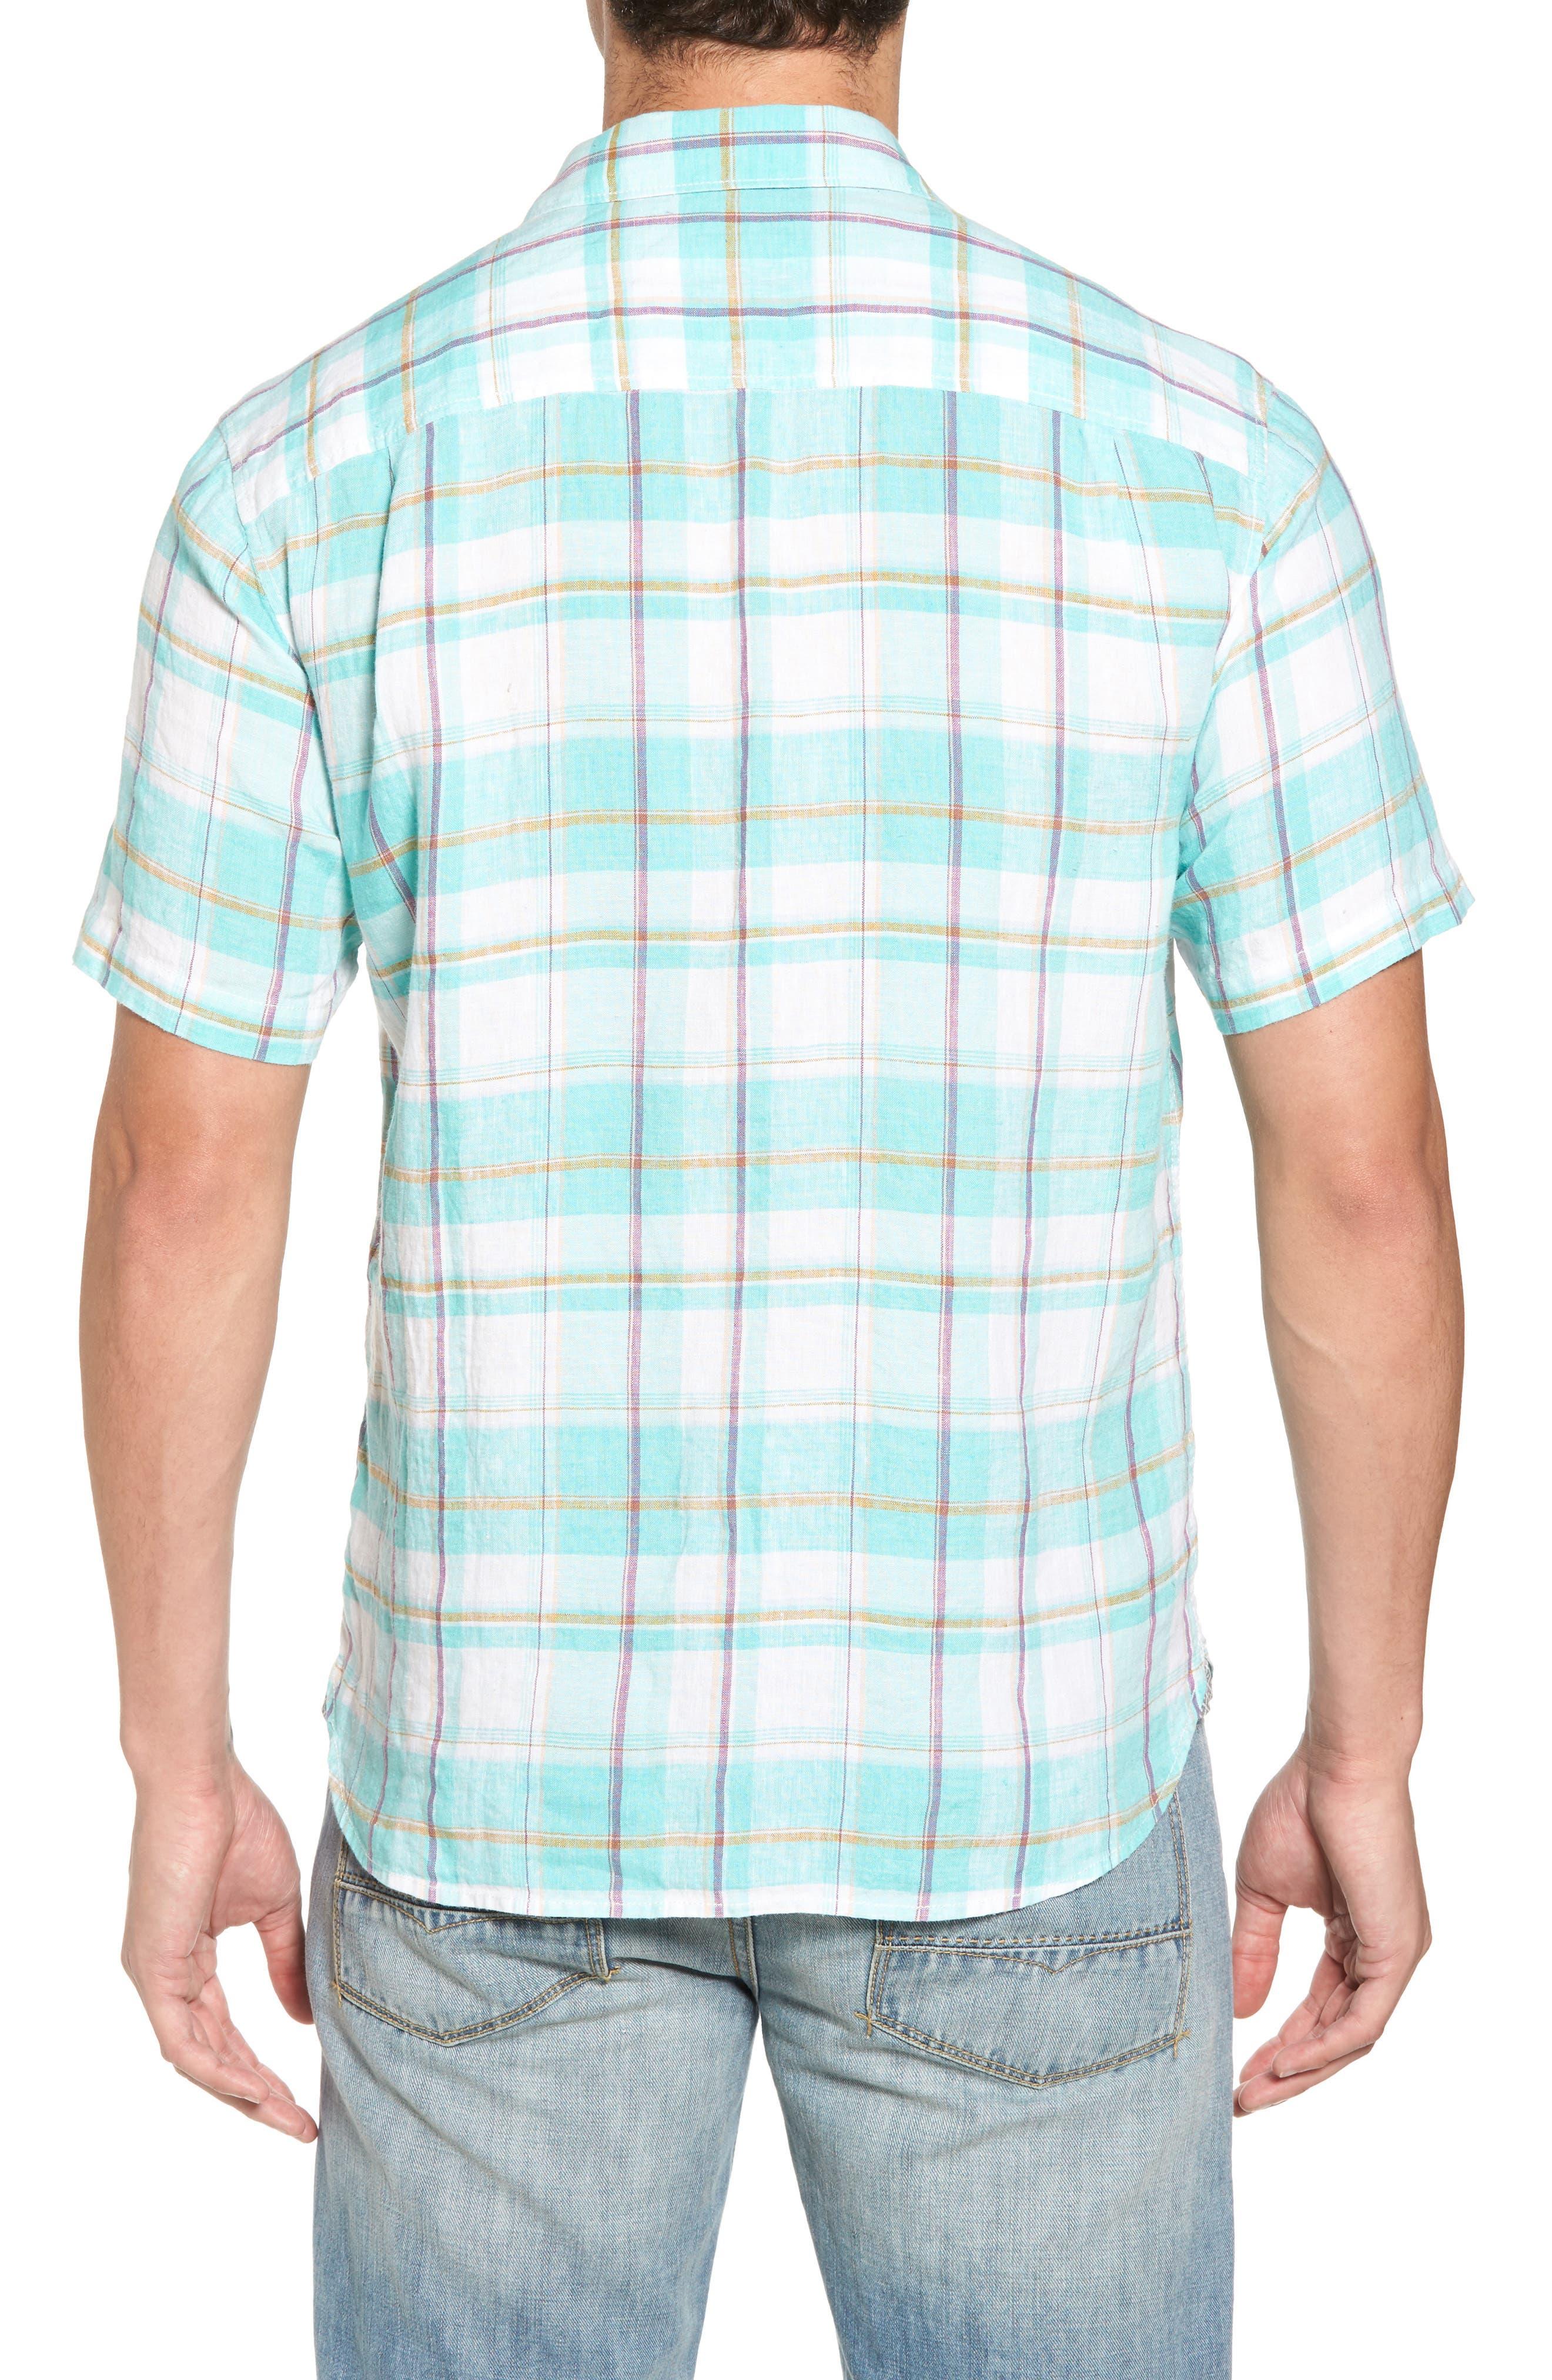 Lauderdale Regular Fit Sport Shirt,                             Alternate thumbnail 2, color,                             Dusty Aqua